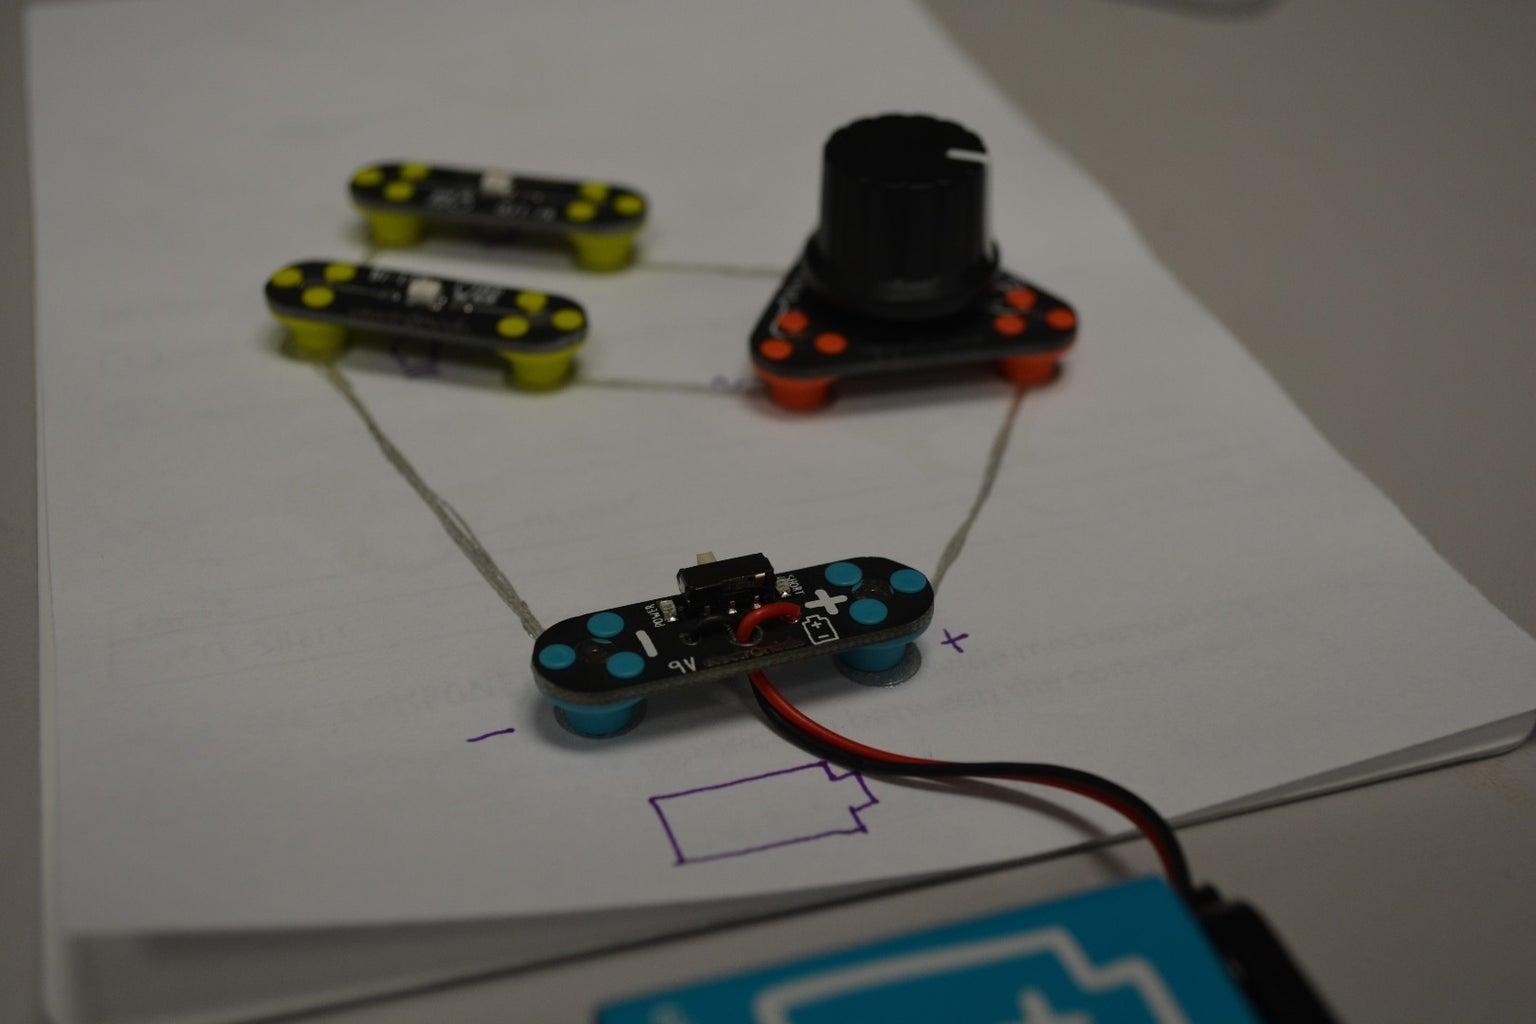 Step 3: Place Elements, Test Design